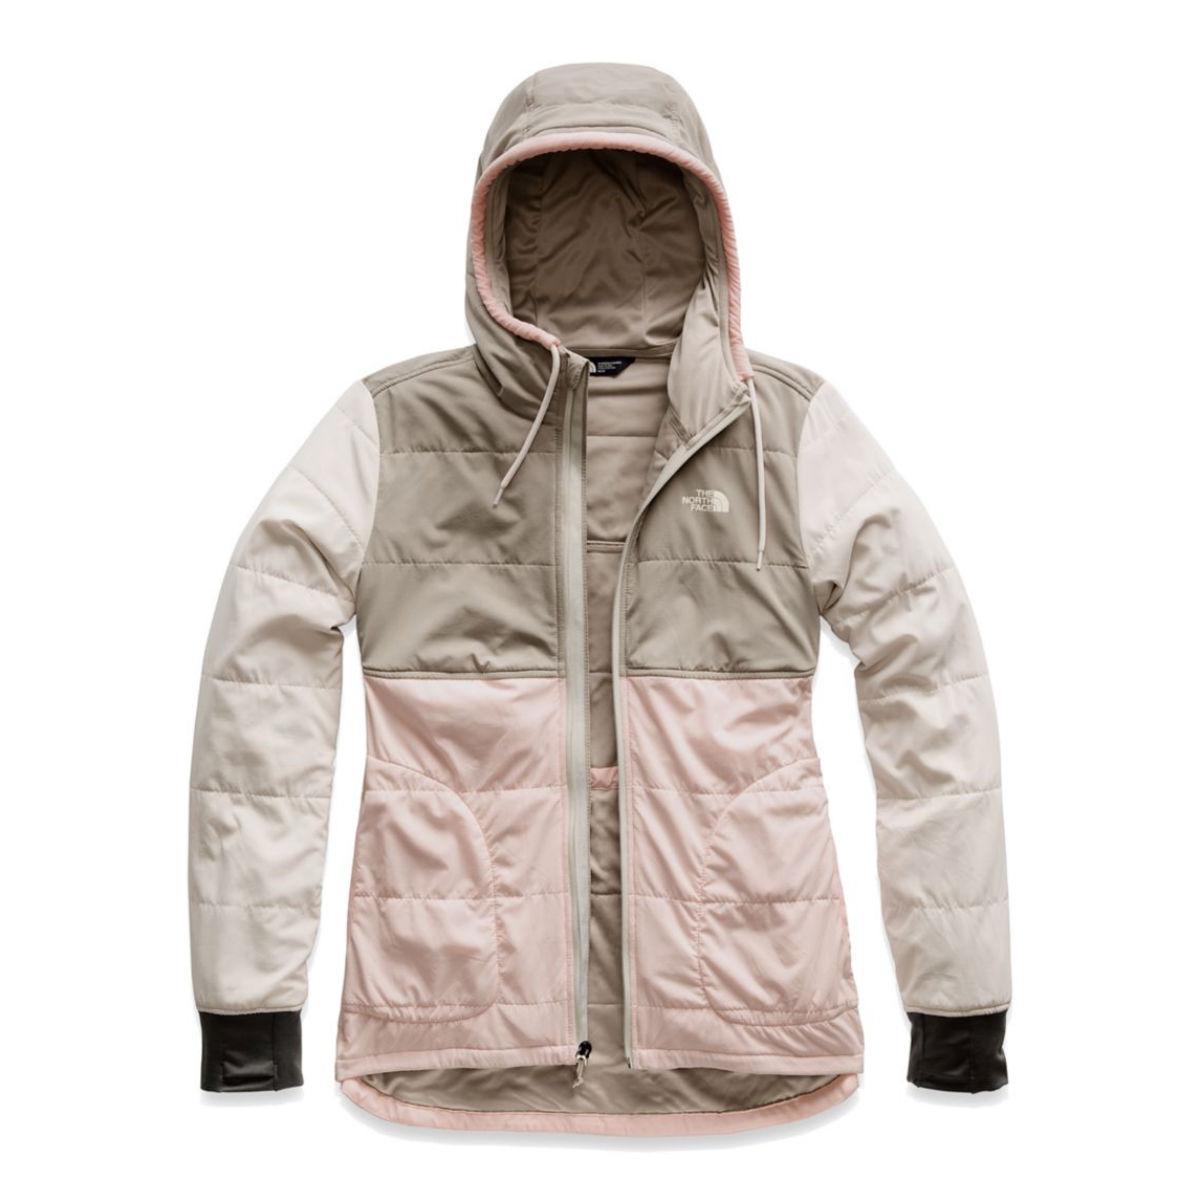 The North Face Women's Mountain Sweatshirt Full Zip Hoodie